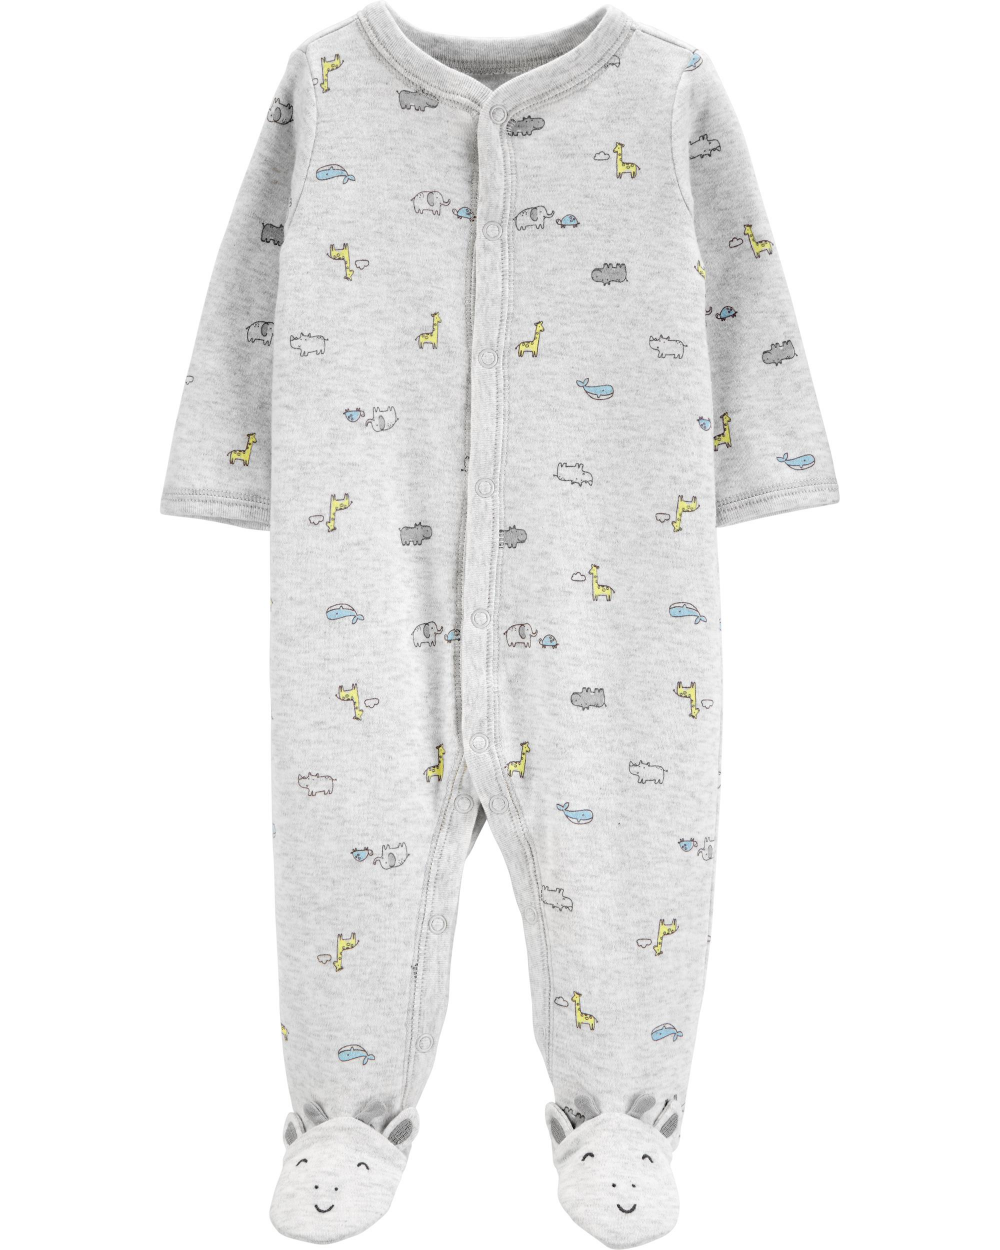 CARTER/'S BABY GIRL/'S ONE PIECE SLEEP /& PLAY JUMPSUIT WITH GIRAFFE NWT